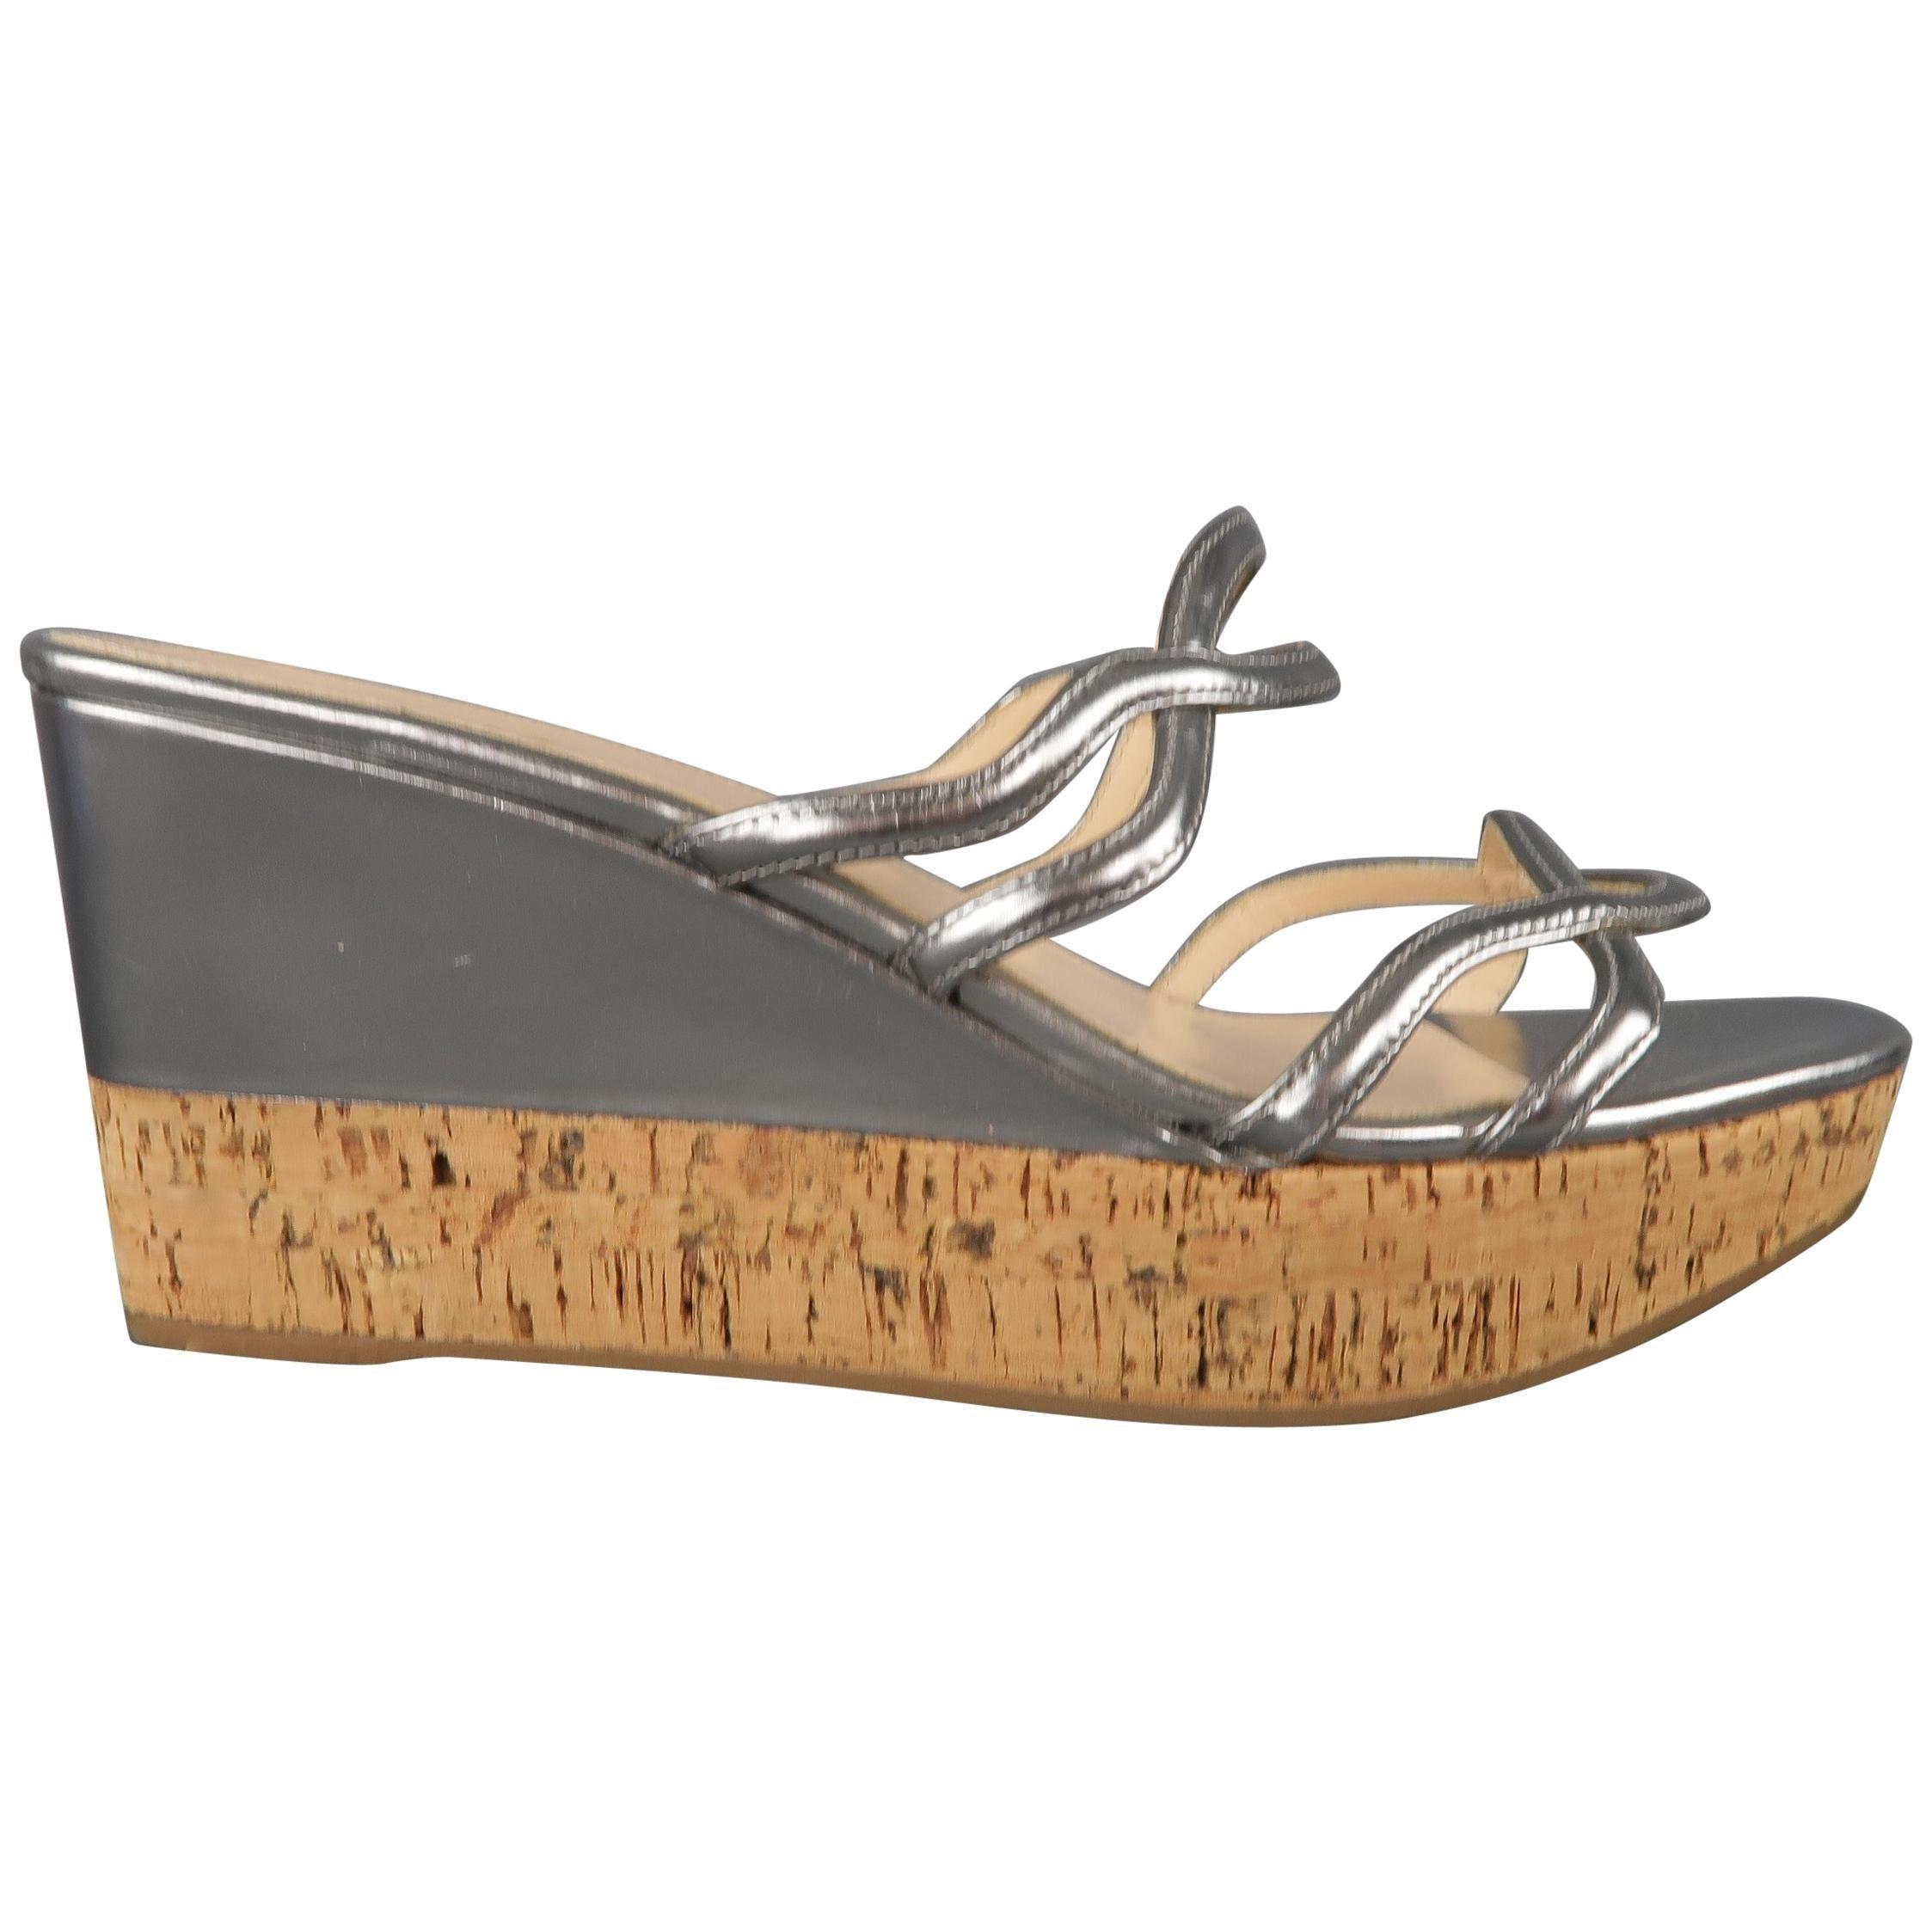 PRADA Size 10 Metallic Silver Leather Cork Wedge Platform Sandals